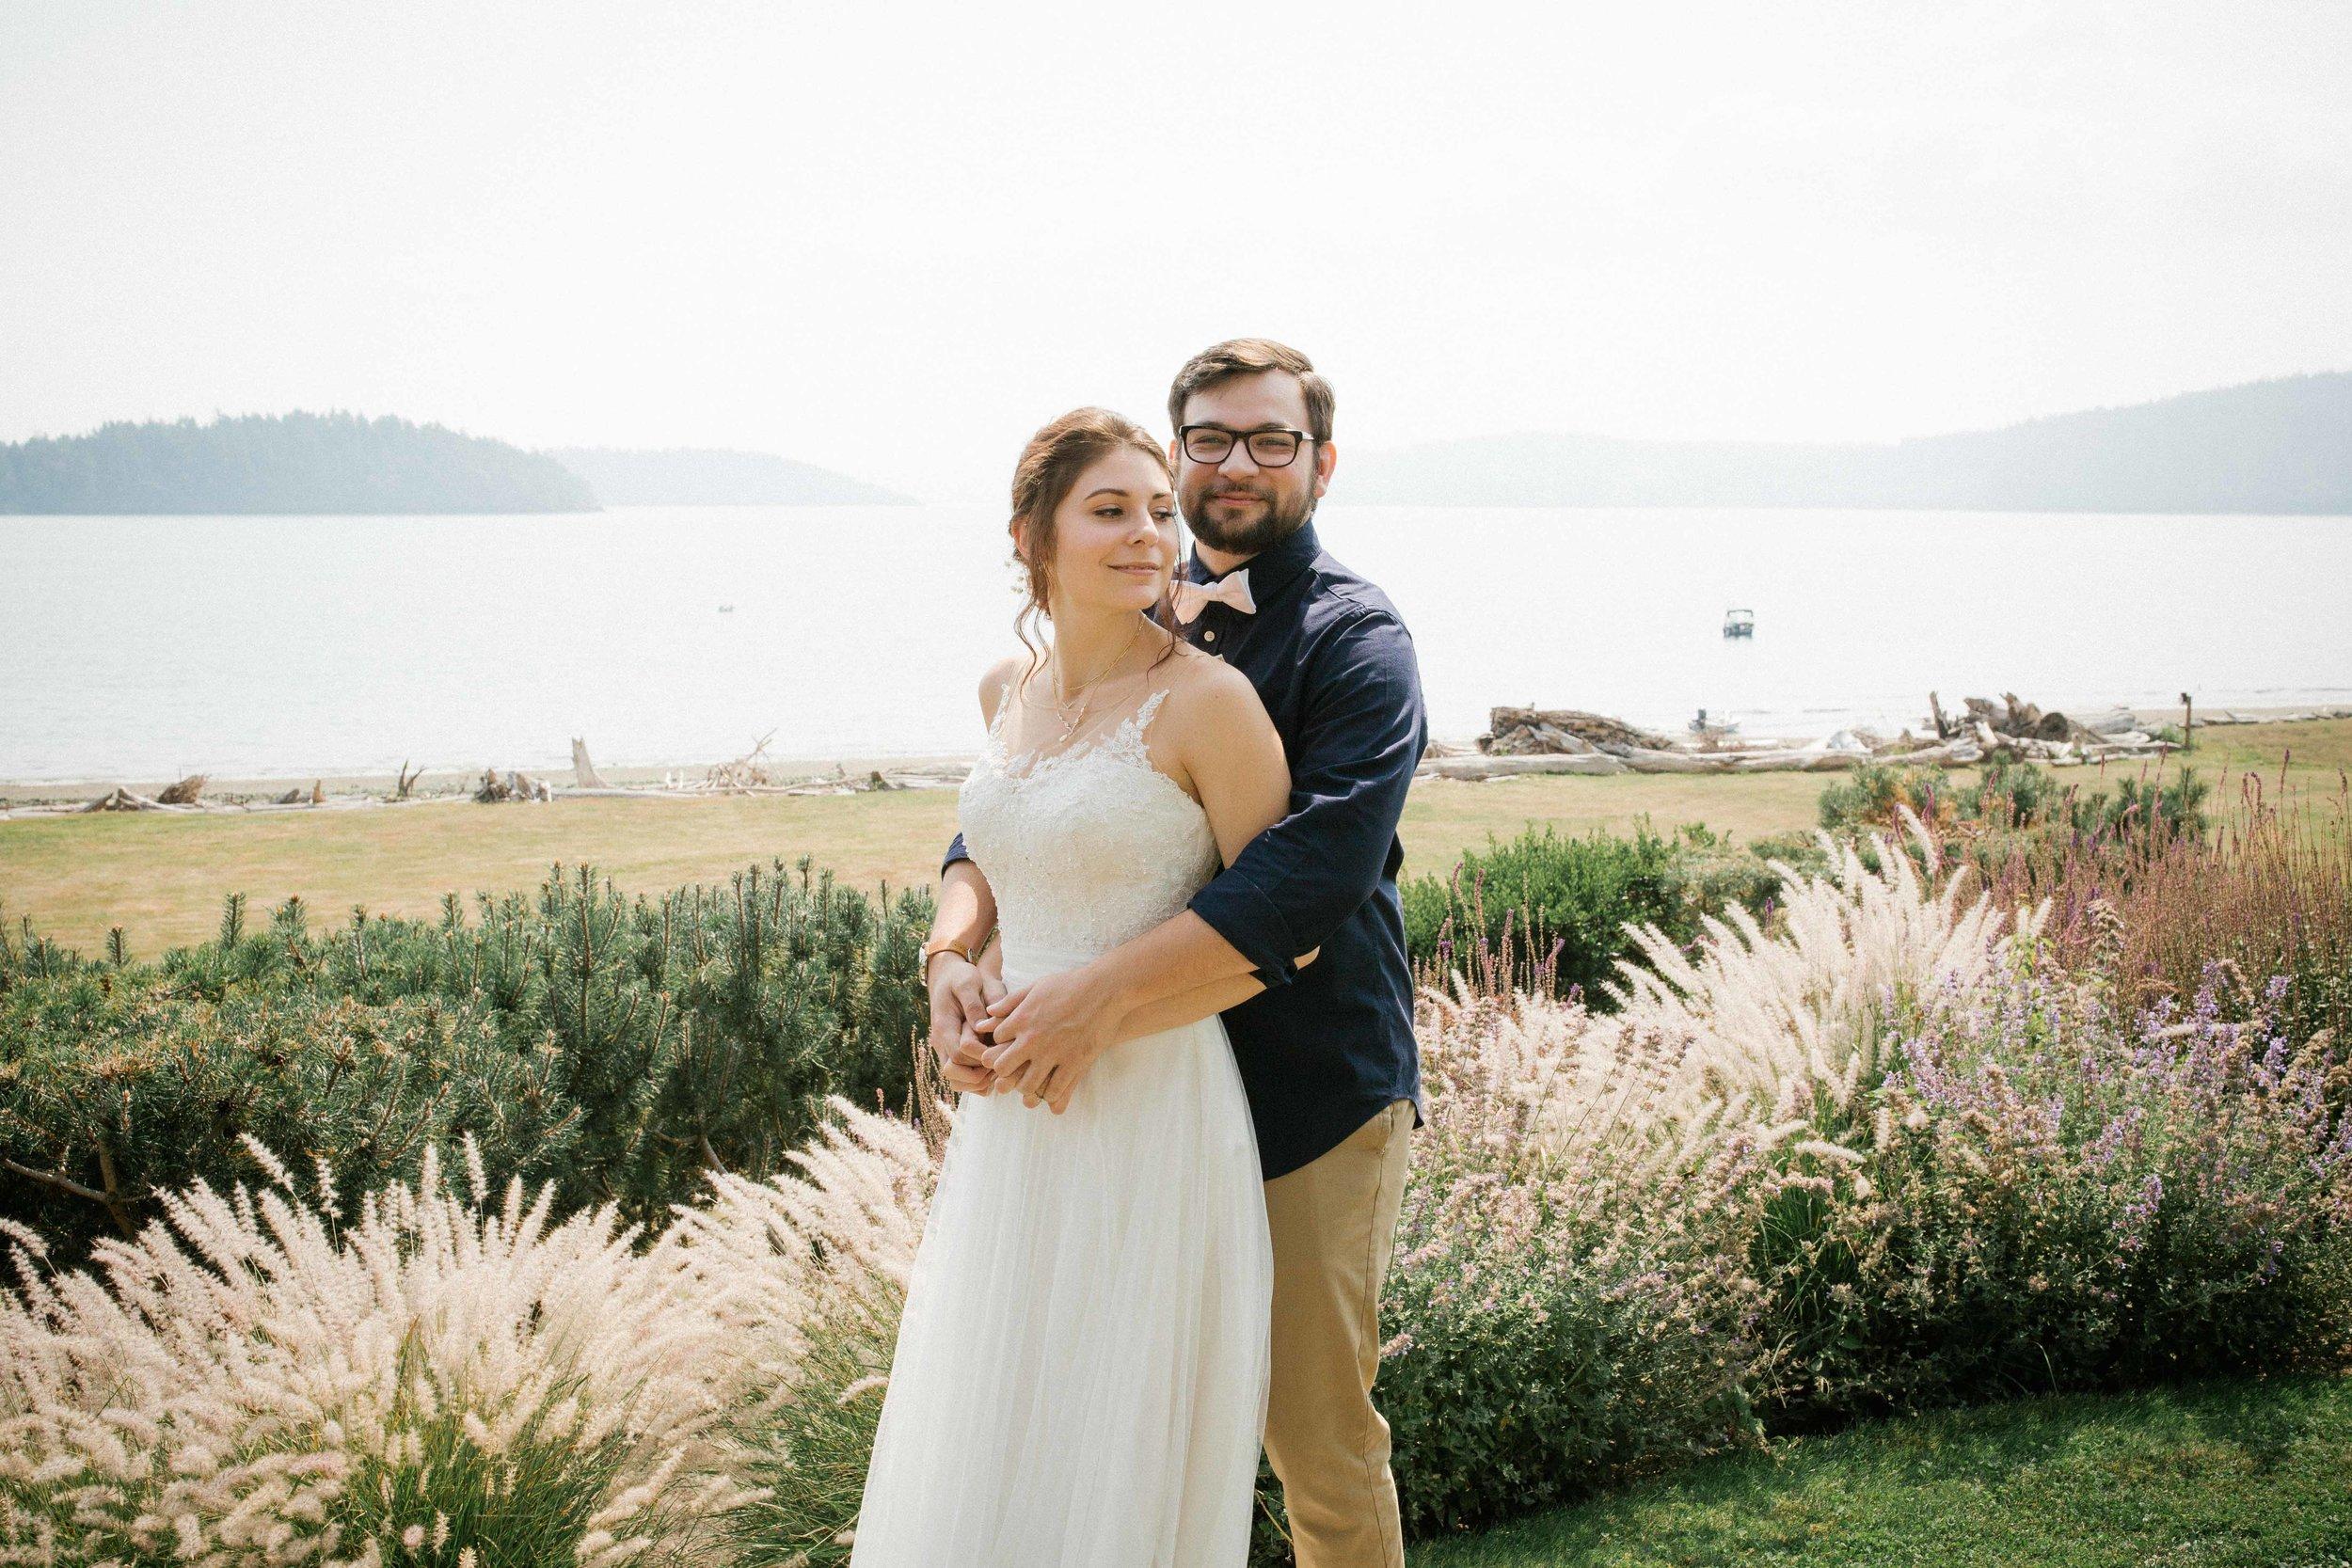 deception-pass-wedding-22.jpg